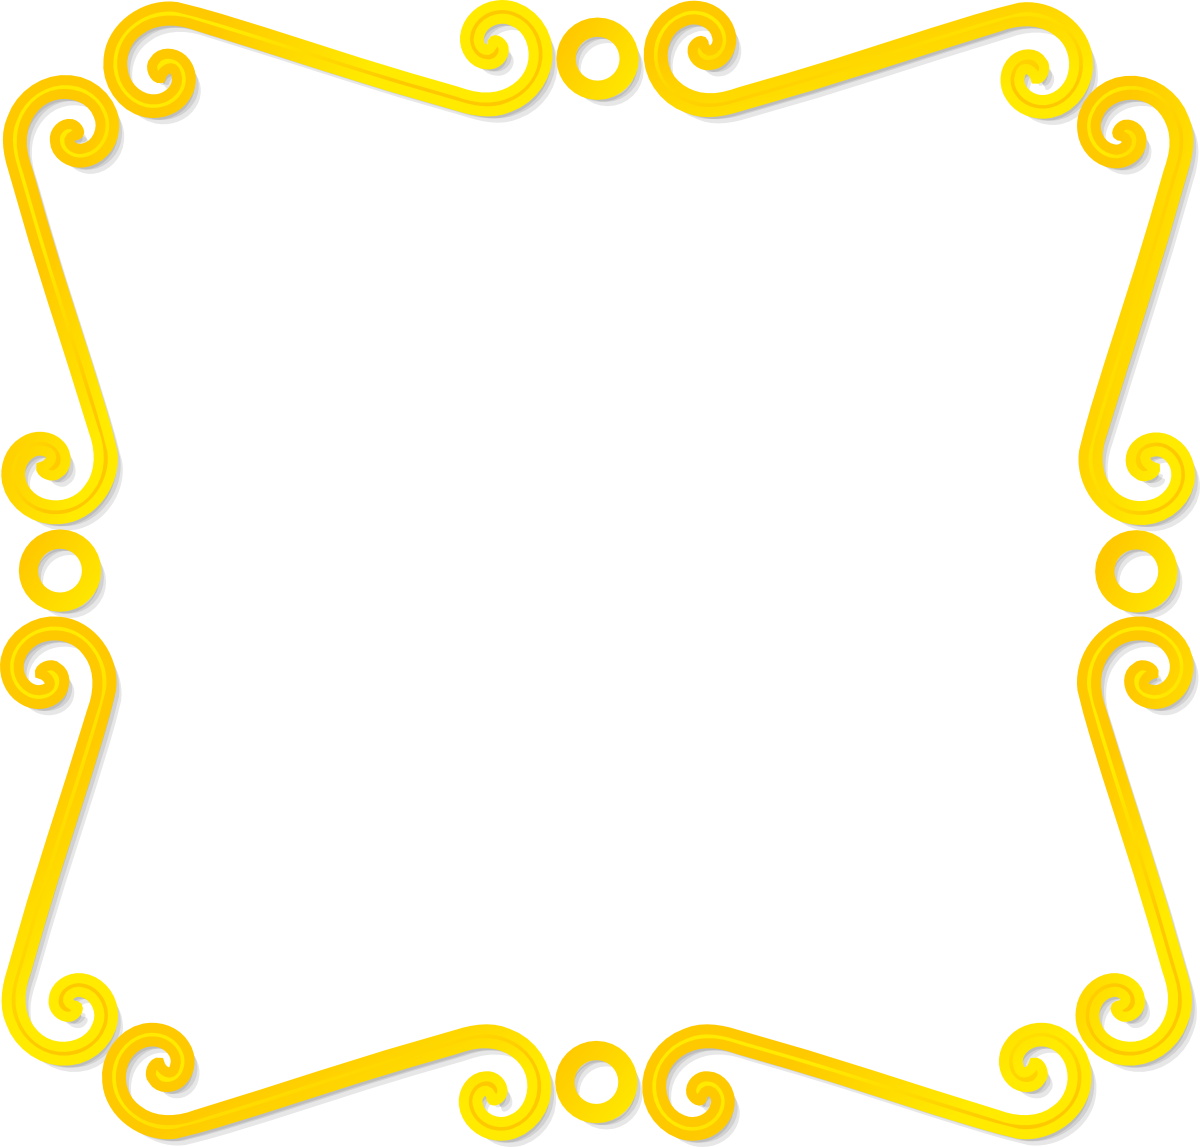 Free Gold Frame Border Png, Download Free Clip Art, Free.